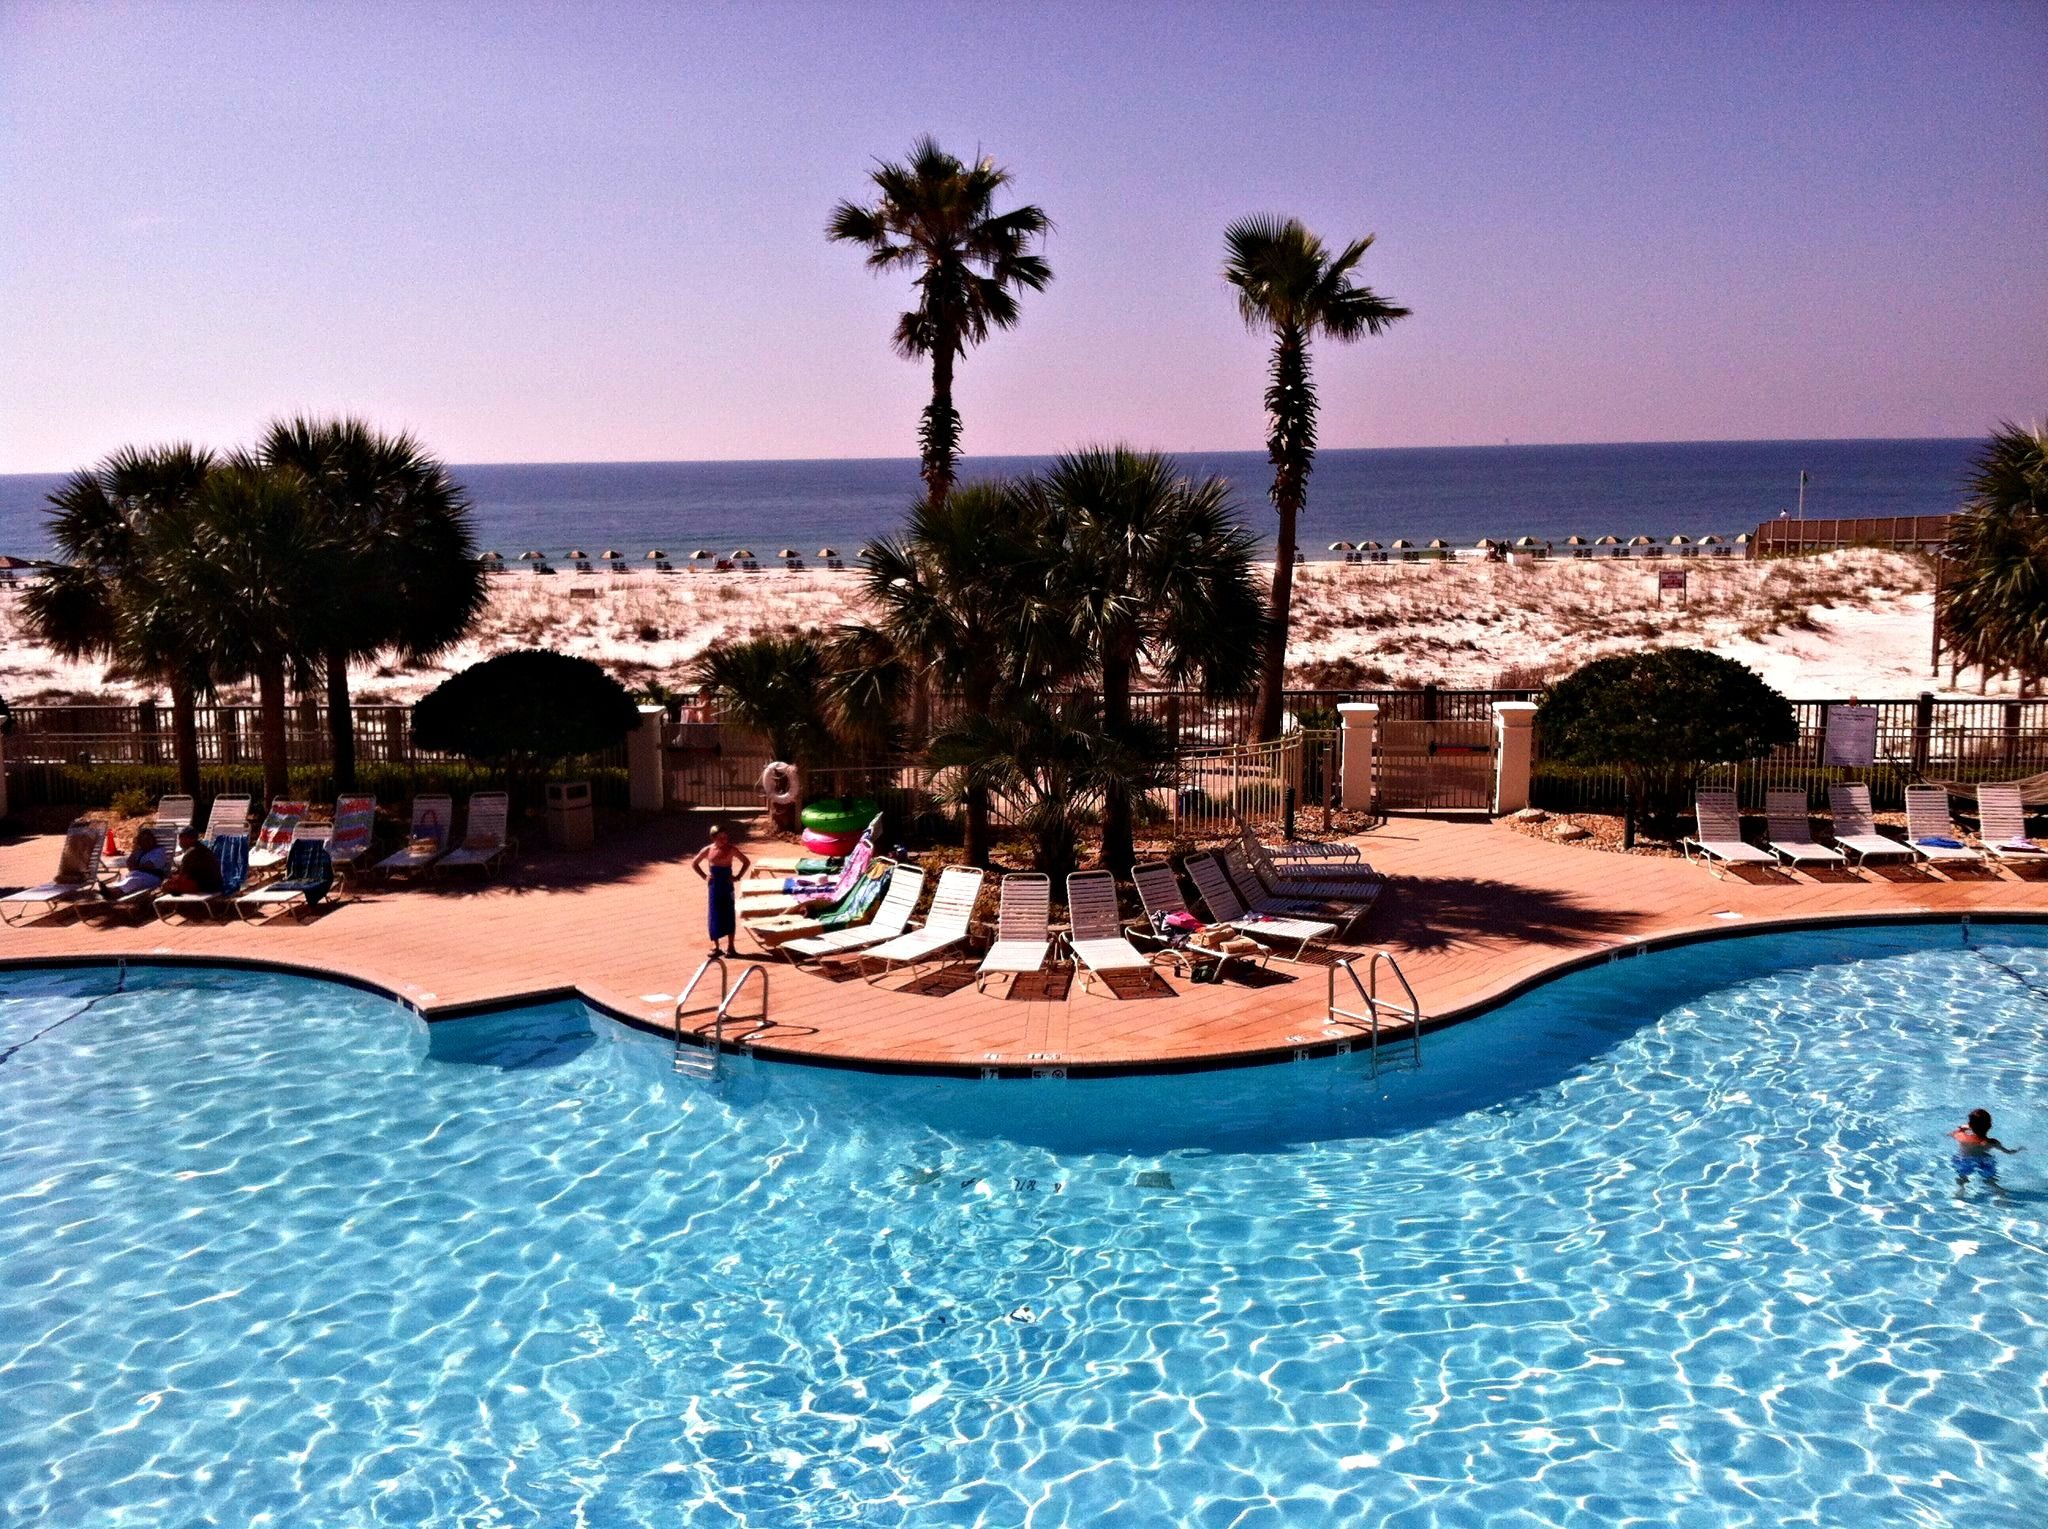 Beach Club Gulf Shores Condo Rentals Beach Club Gulf Shores Resorts Alabama Vacation